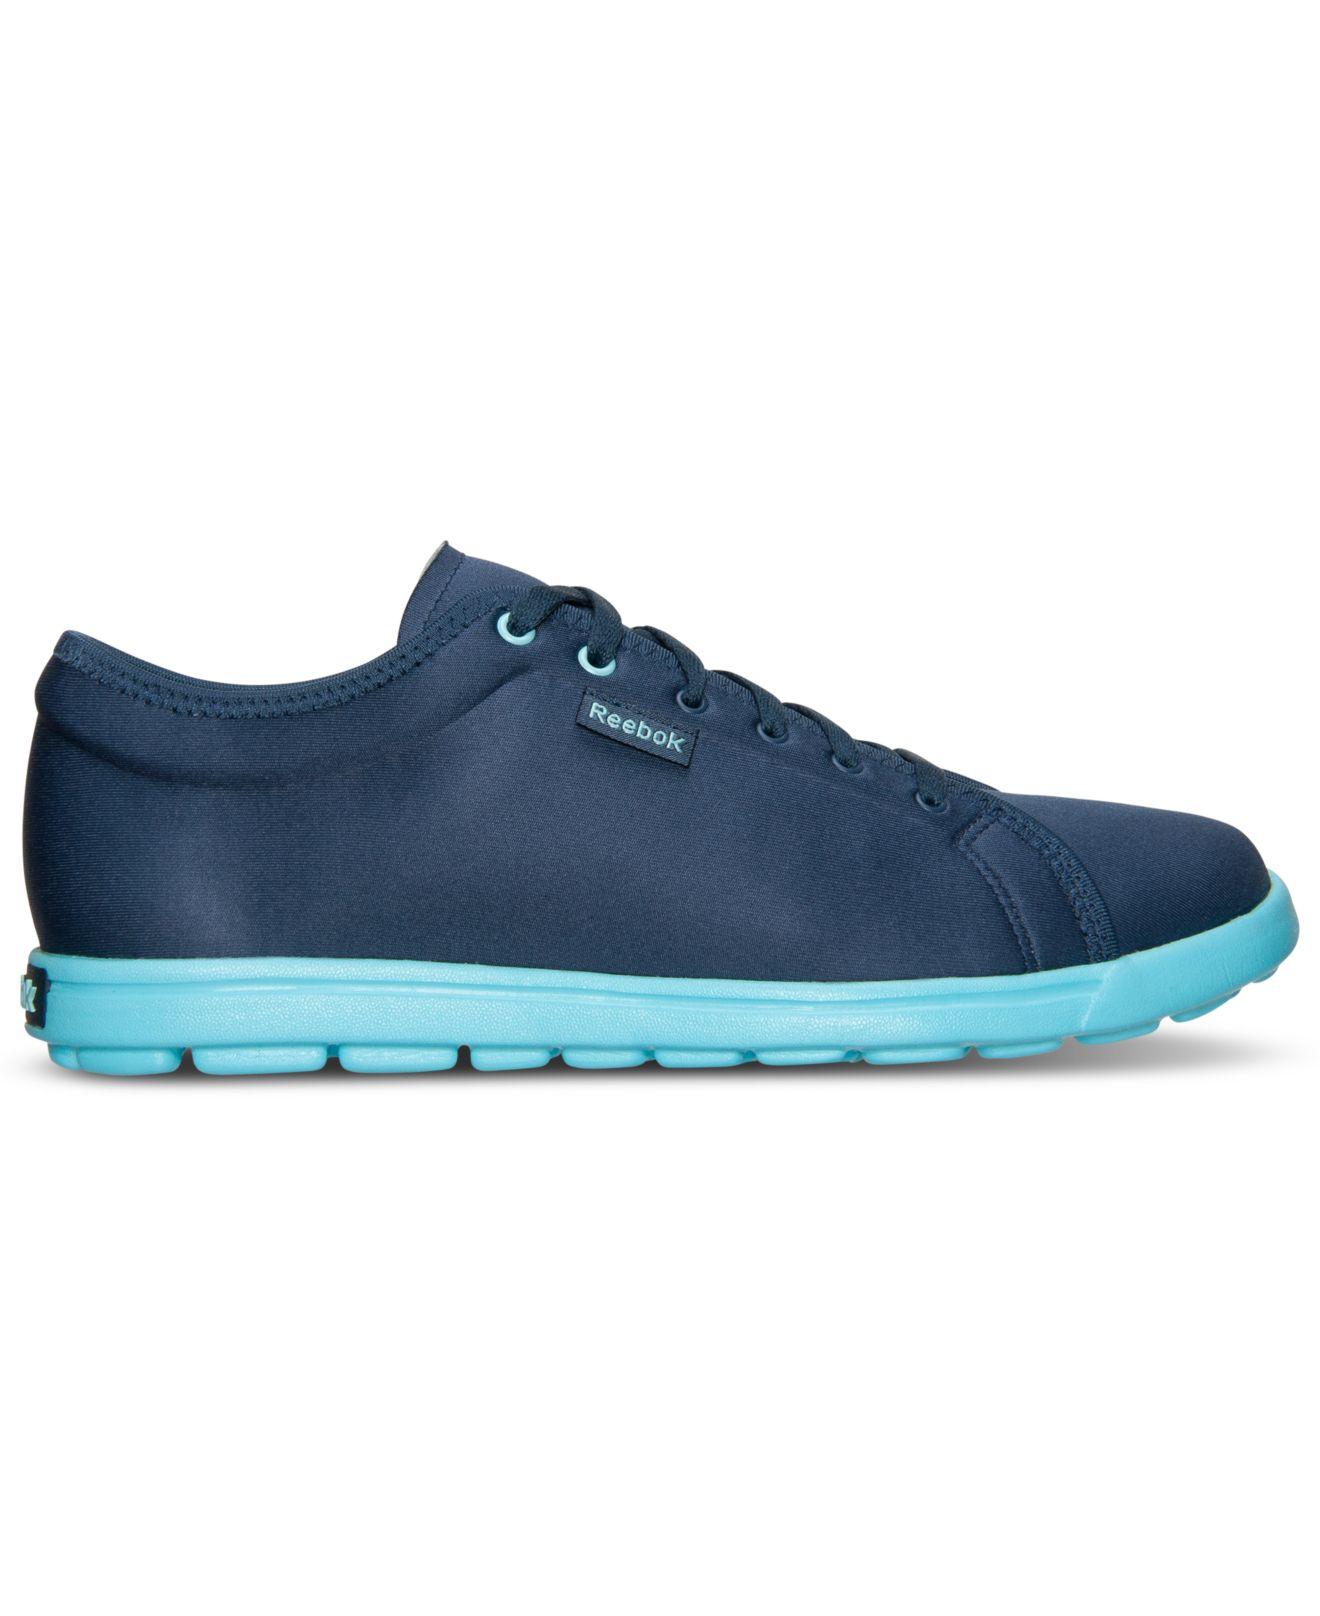 Reebok Skyscape Runaround   Women S Casual Shoes